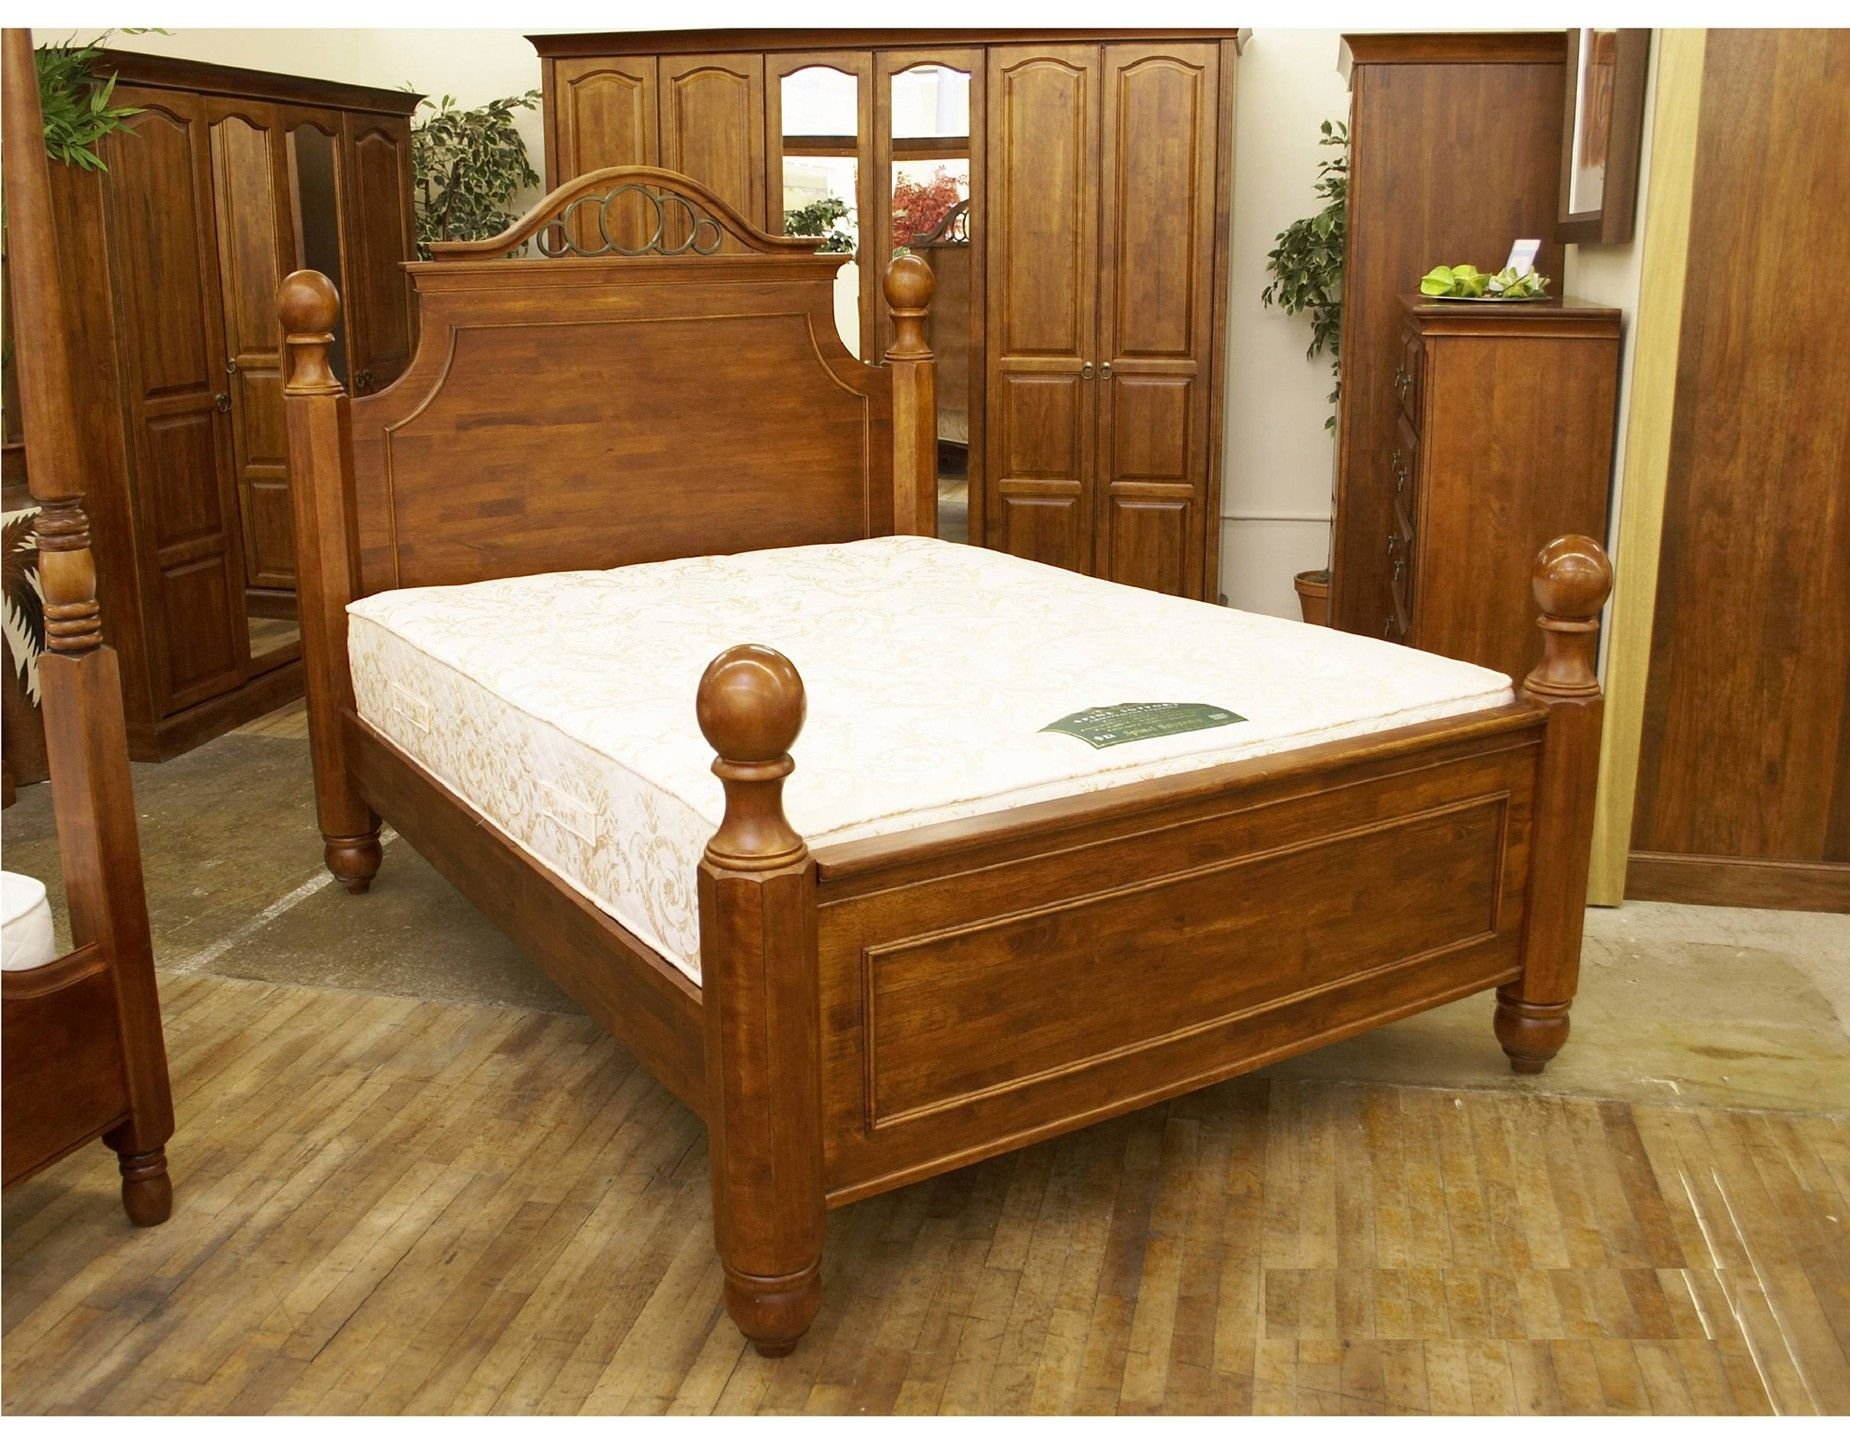 explore oak bedroom furniture furniture image and more